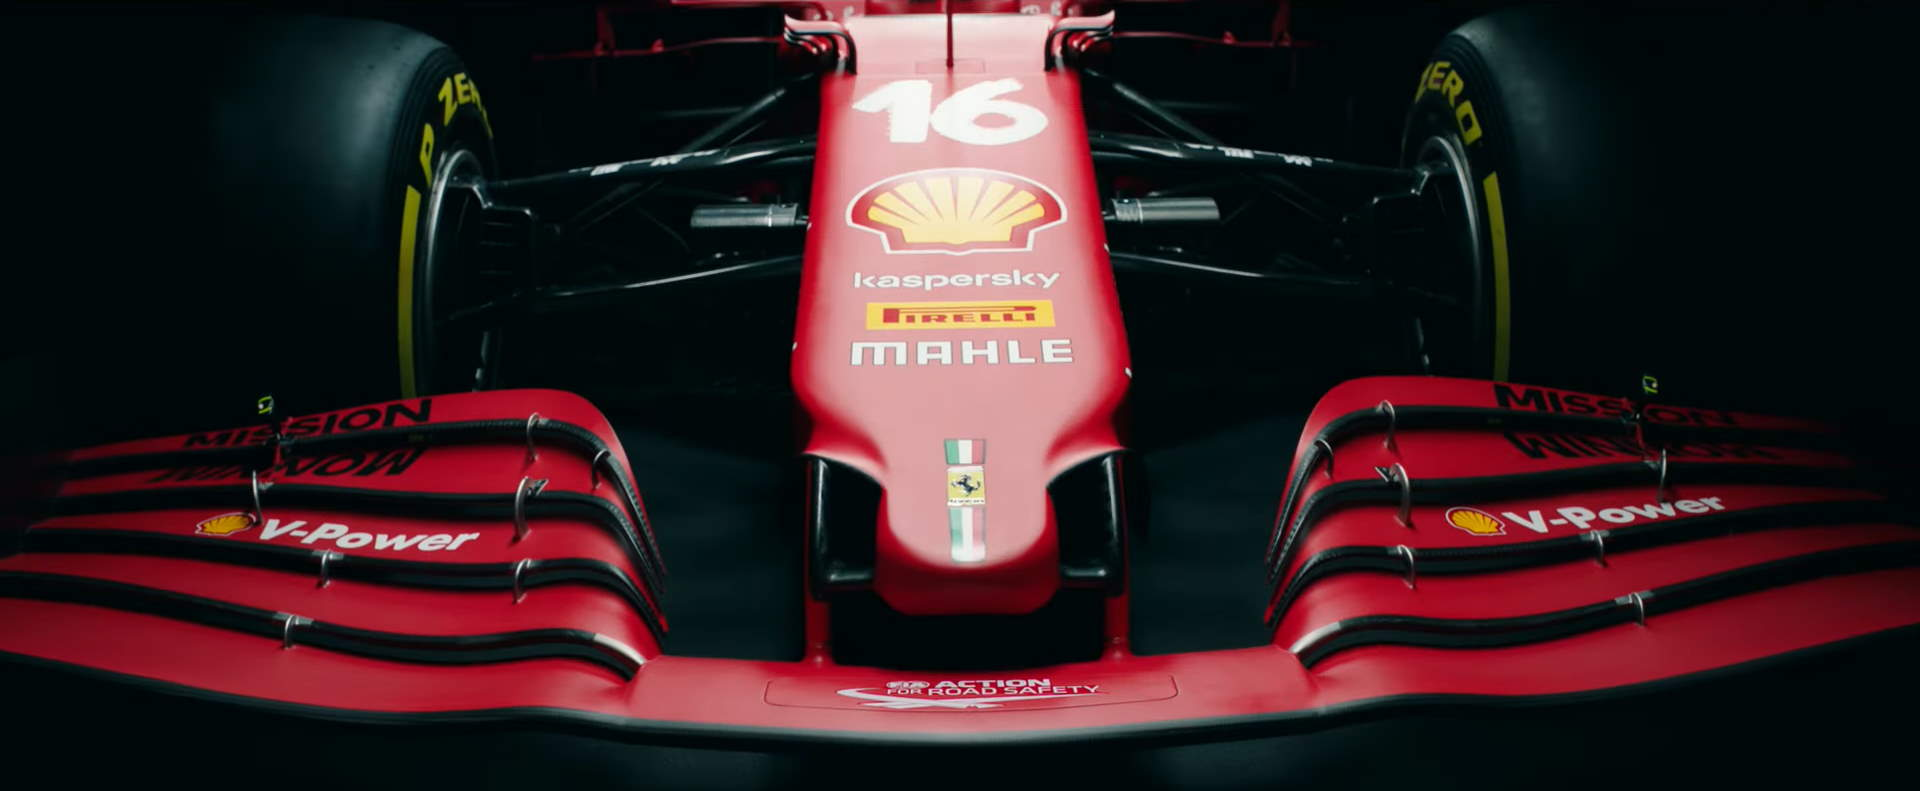 2021 Ferrari SF21 Screenshot Youtube F1 launch nose and front wing Photo Ferrari